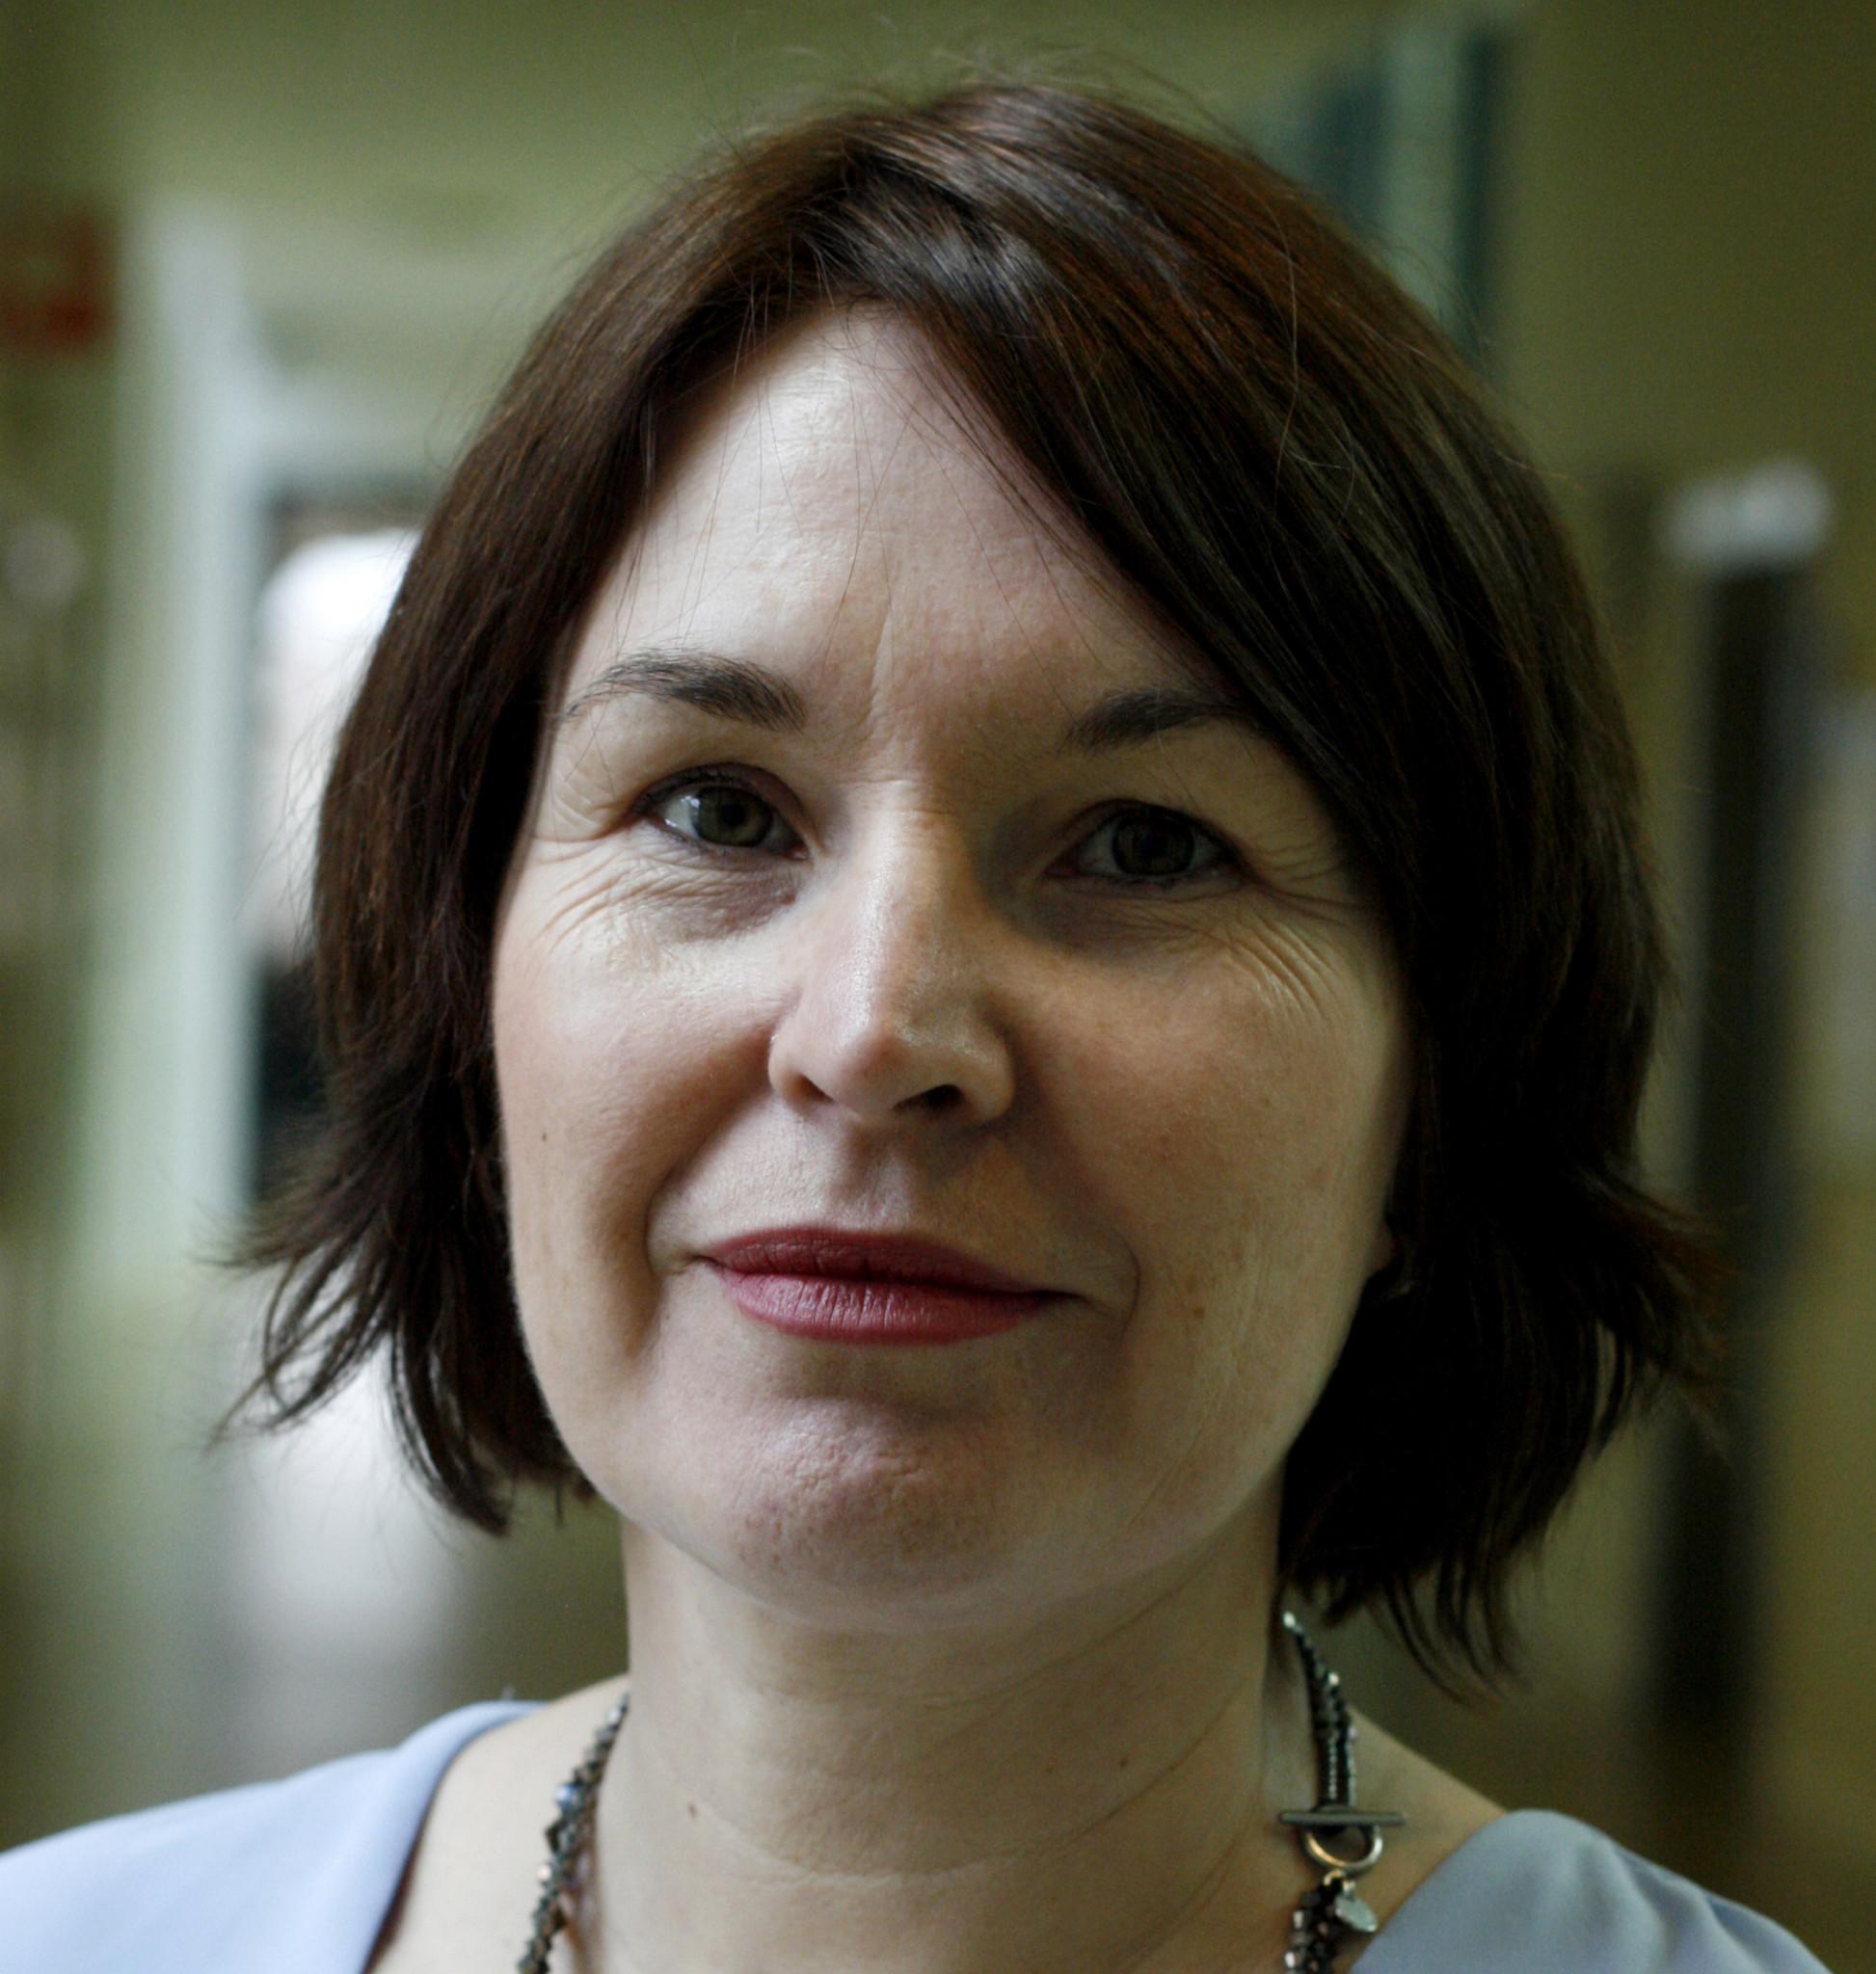 Katarina Samuelsson